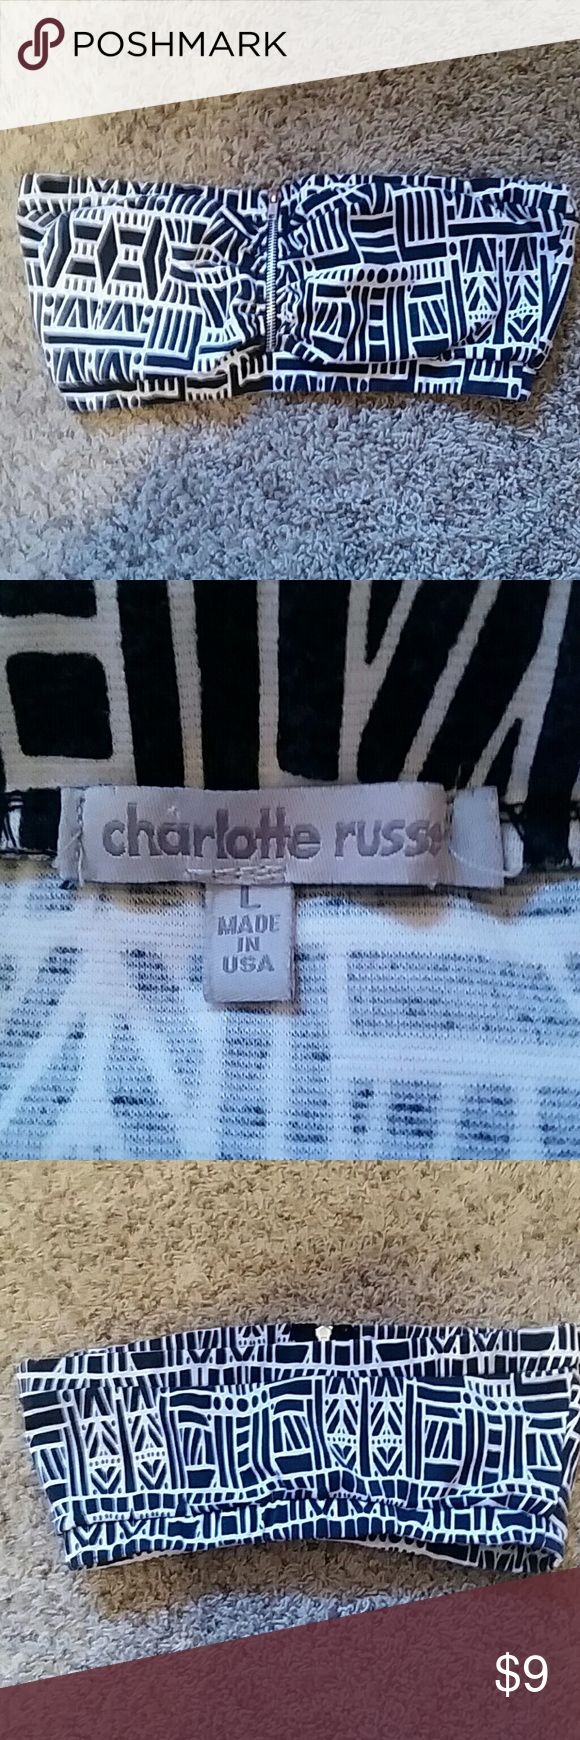 Charlotte Russe size L tribal bandeau top Charlotte Russe size L tribal bandeau top Charlotte Russe Tops Crop Tops